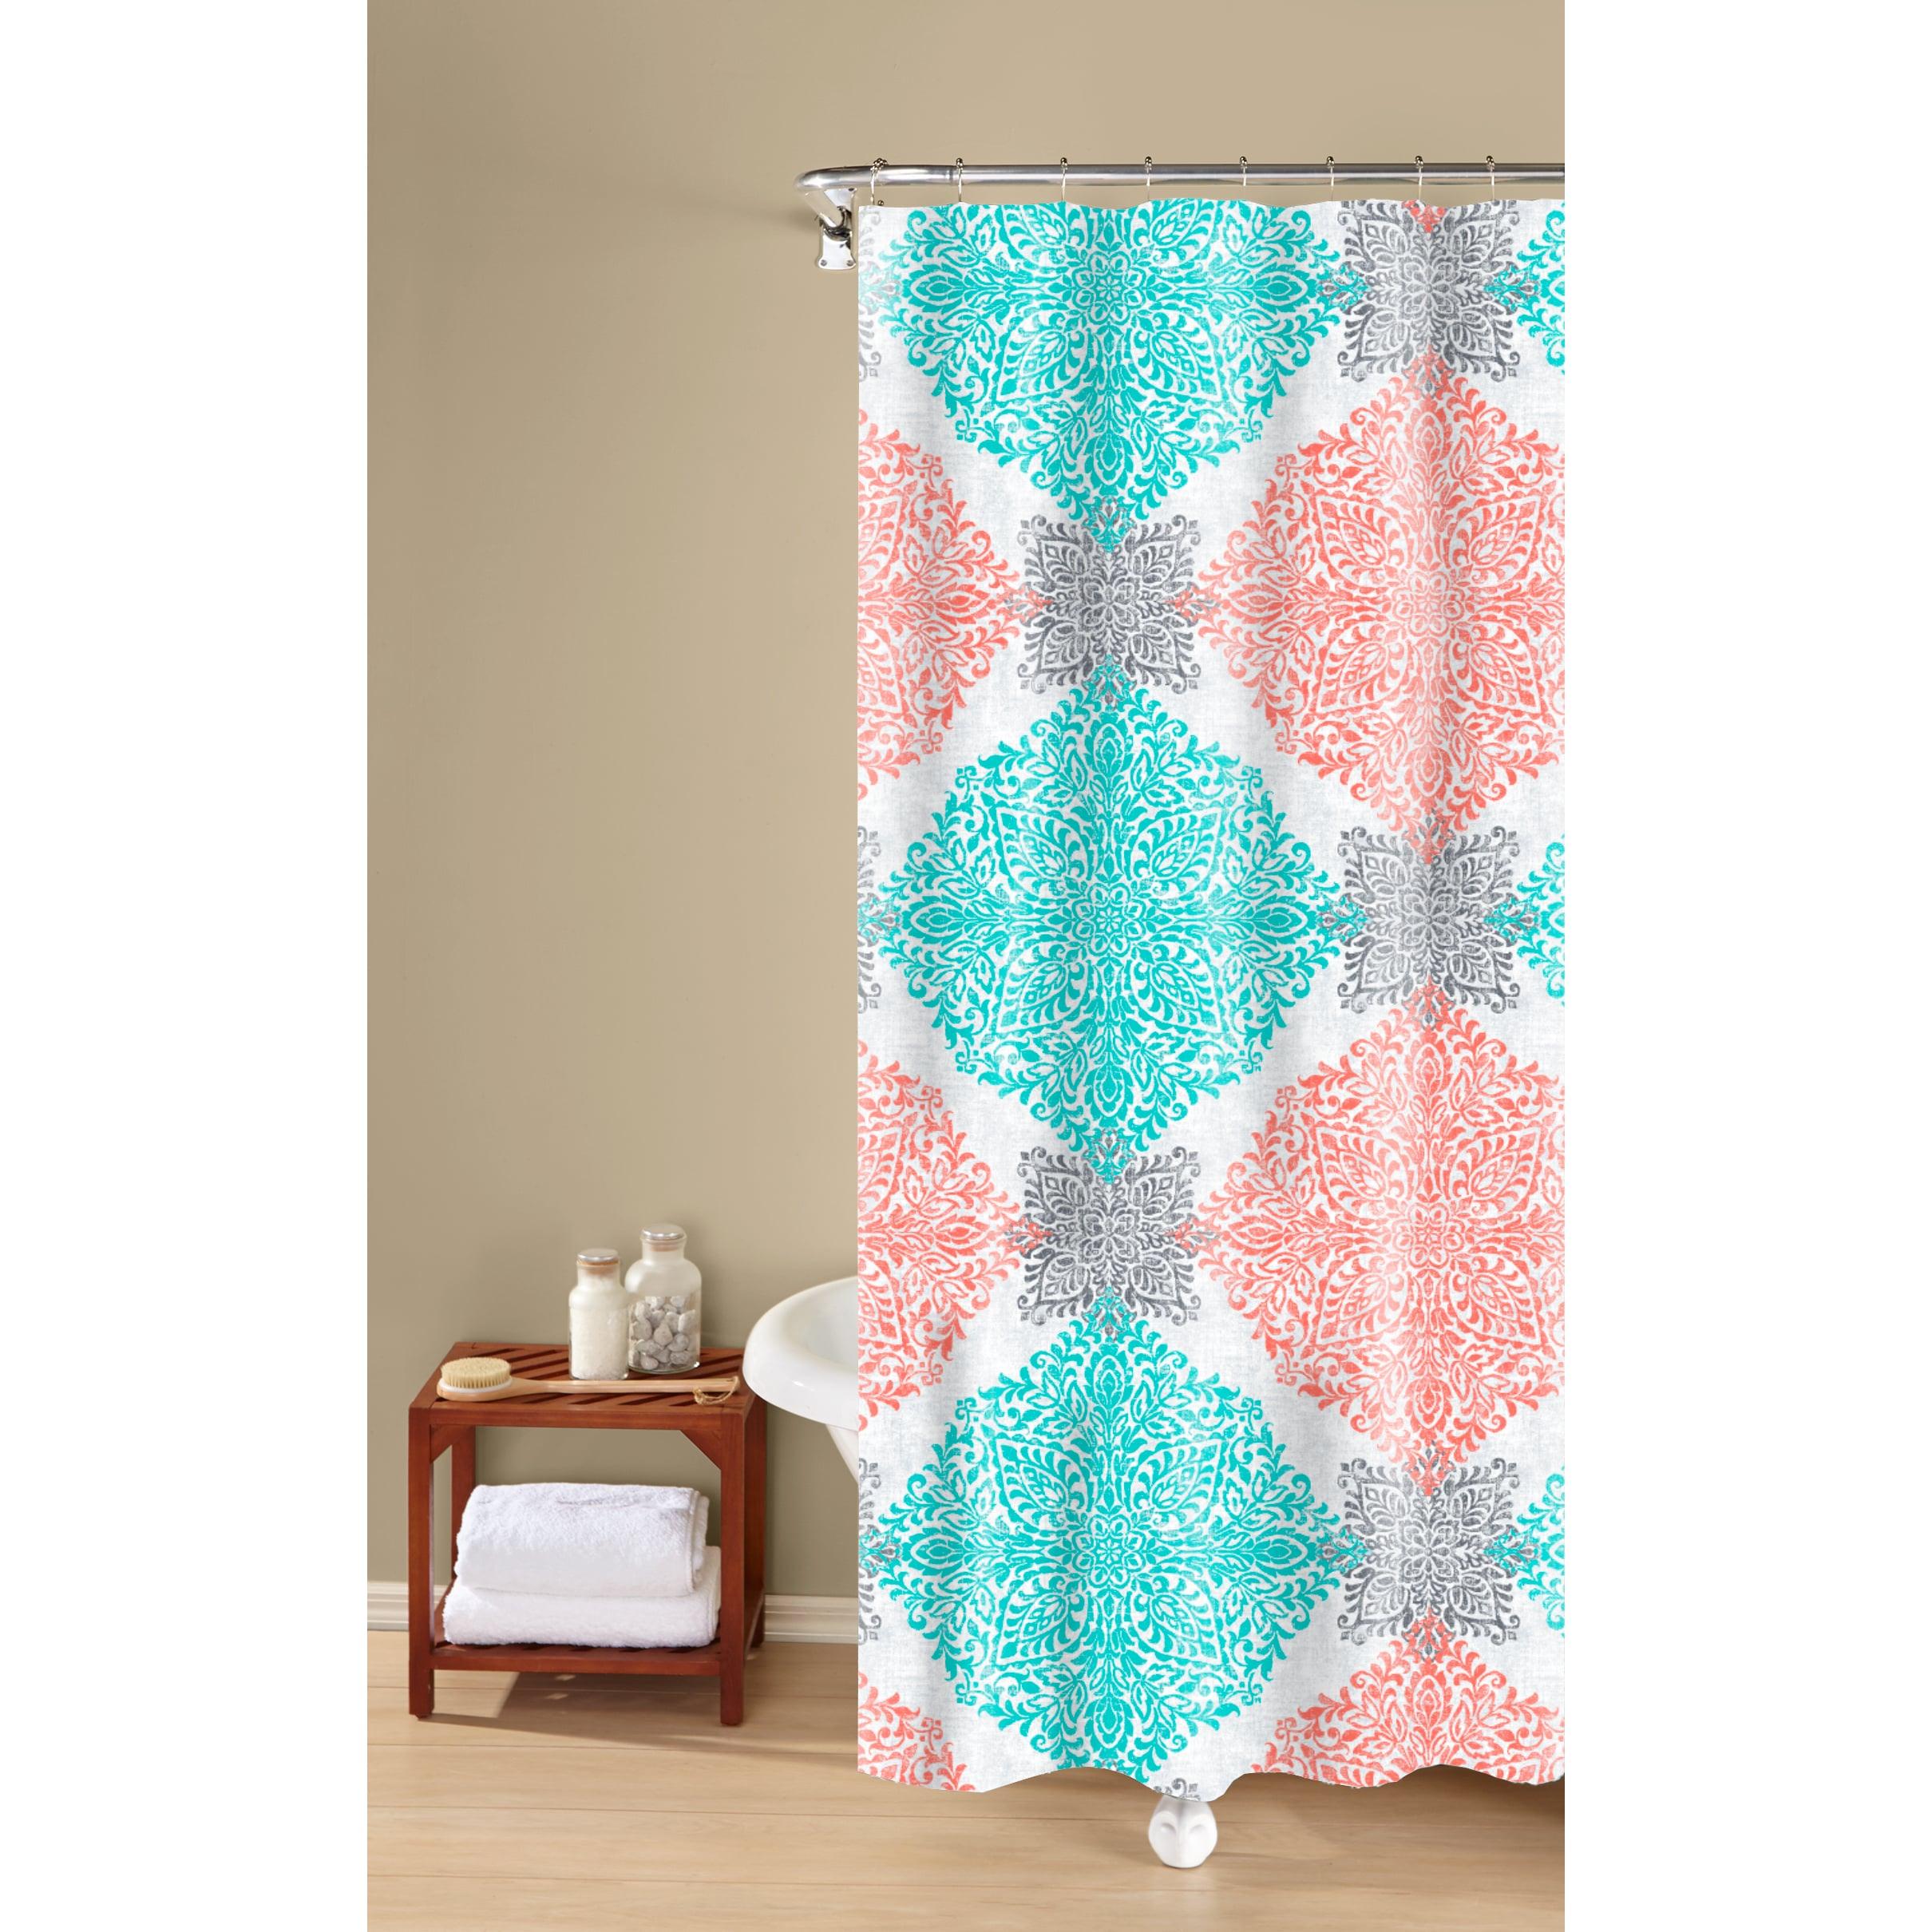 Shop Ava Medallion Print Textured Fabric Easy Care Shower Curtain